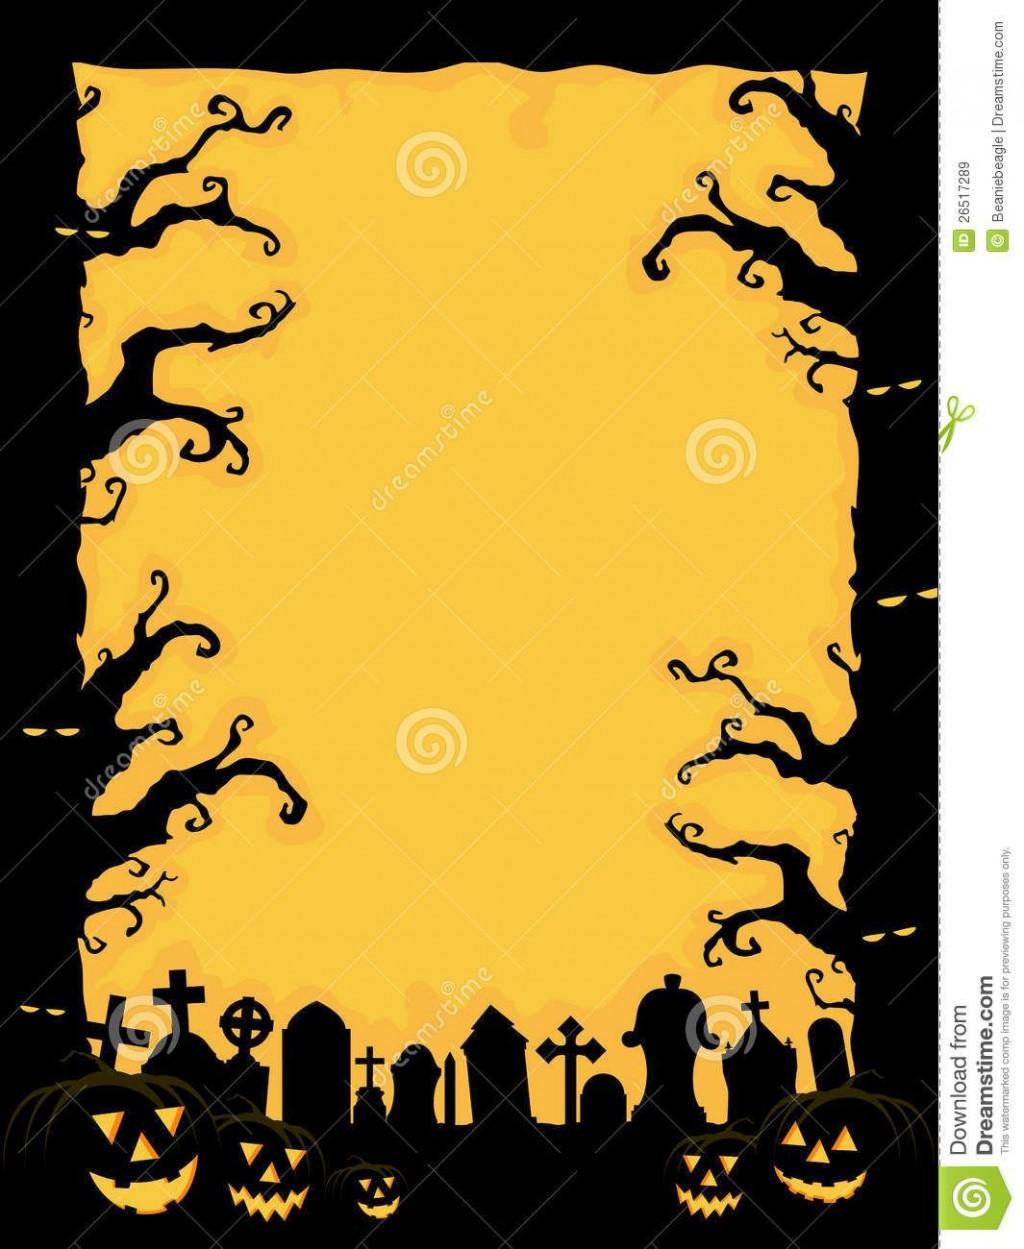 003 Striking Free Halloween Invitation Template Design  Templates Microsoft Word Wedding Printable PartyLarge